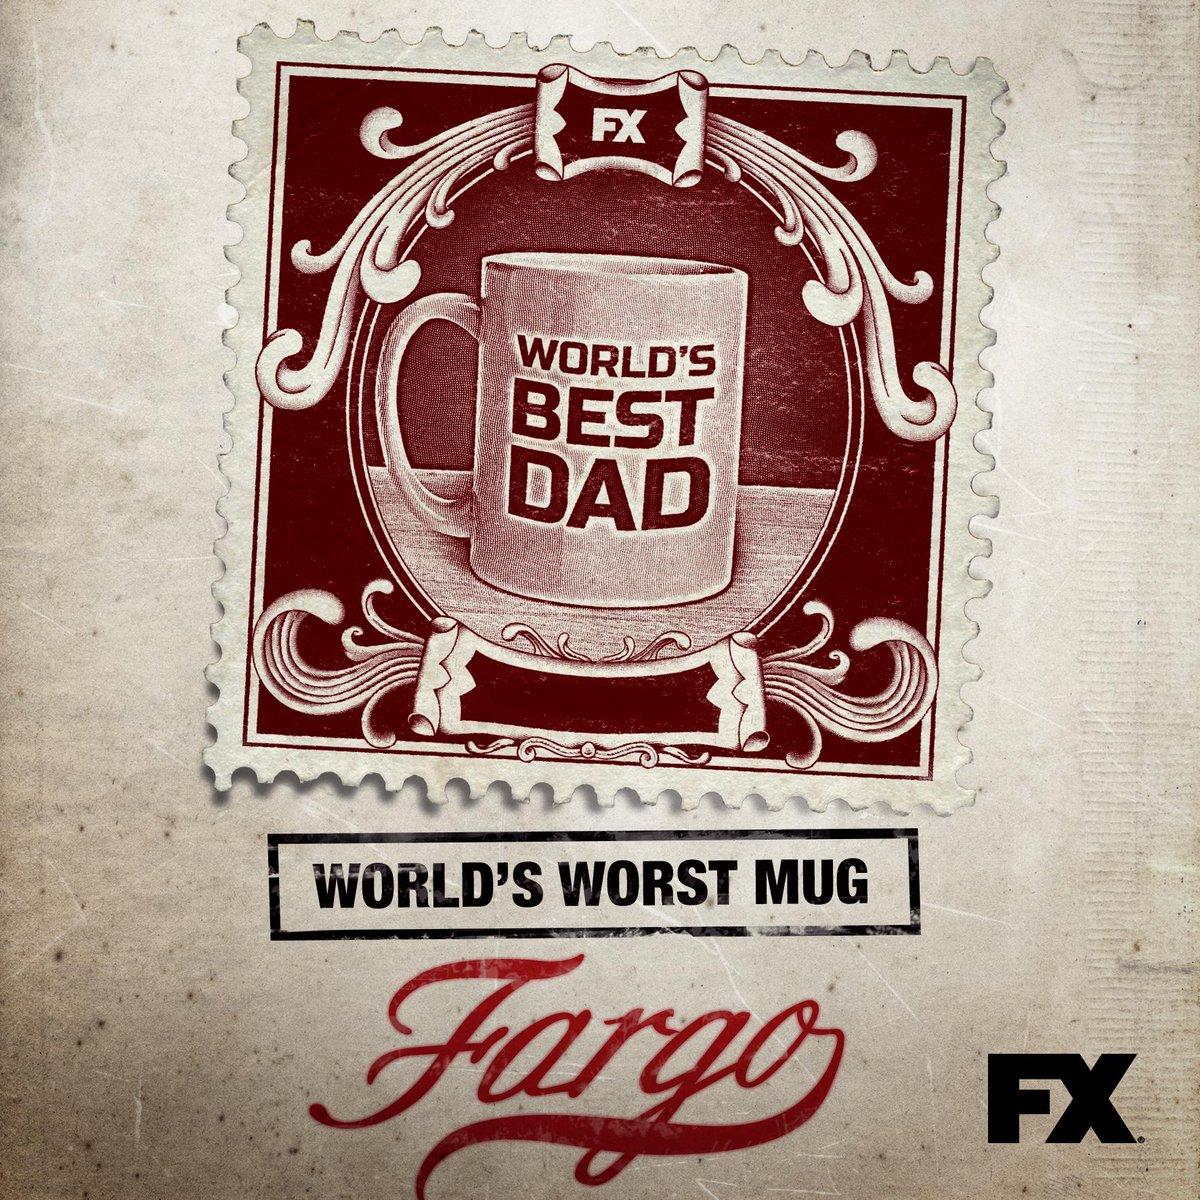 Mug half empty, or half full? #Fargo